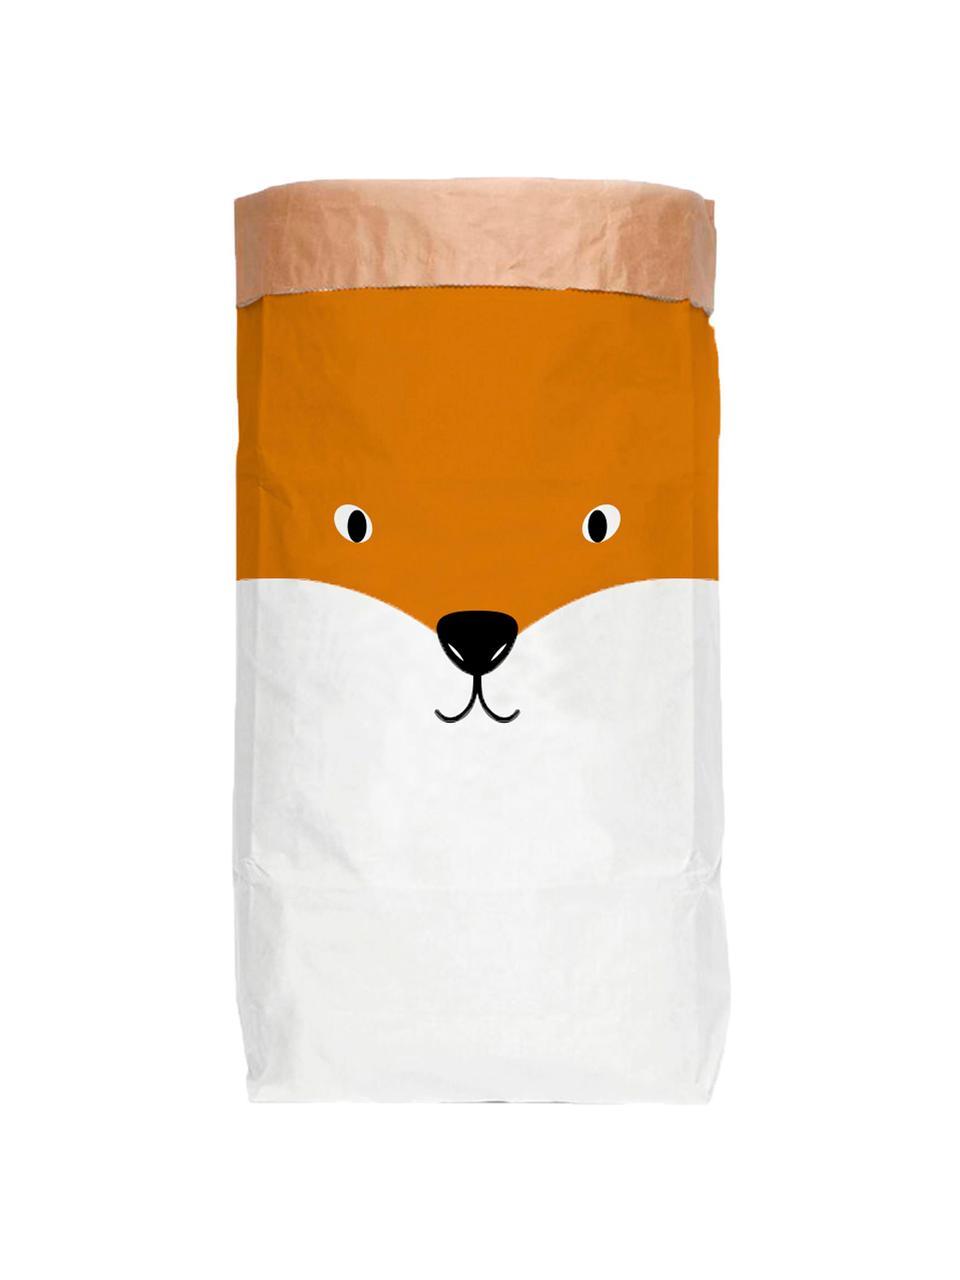 Sac de rangement Fox, Blanc, orange, noir